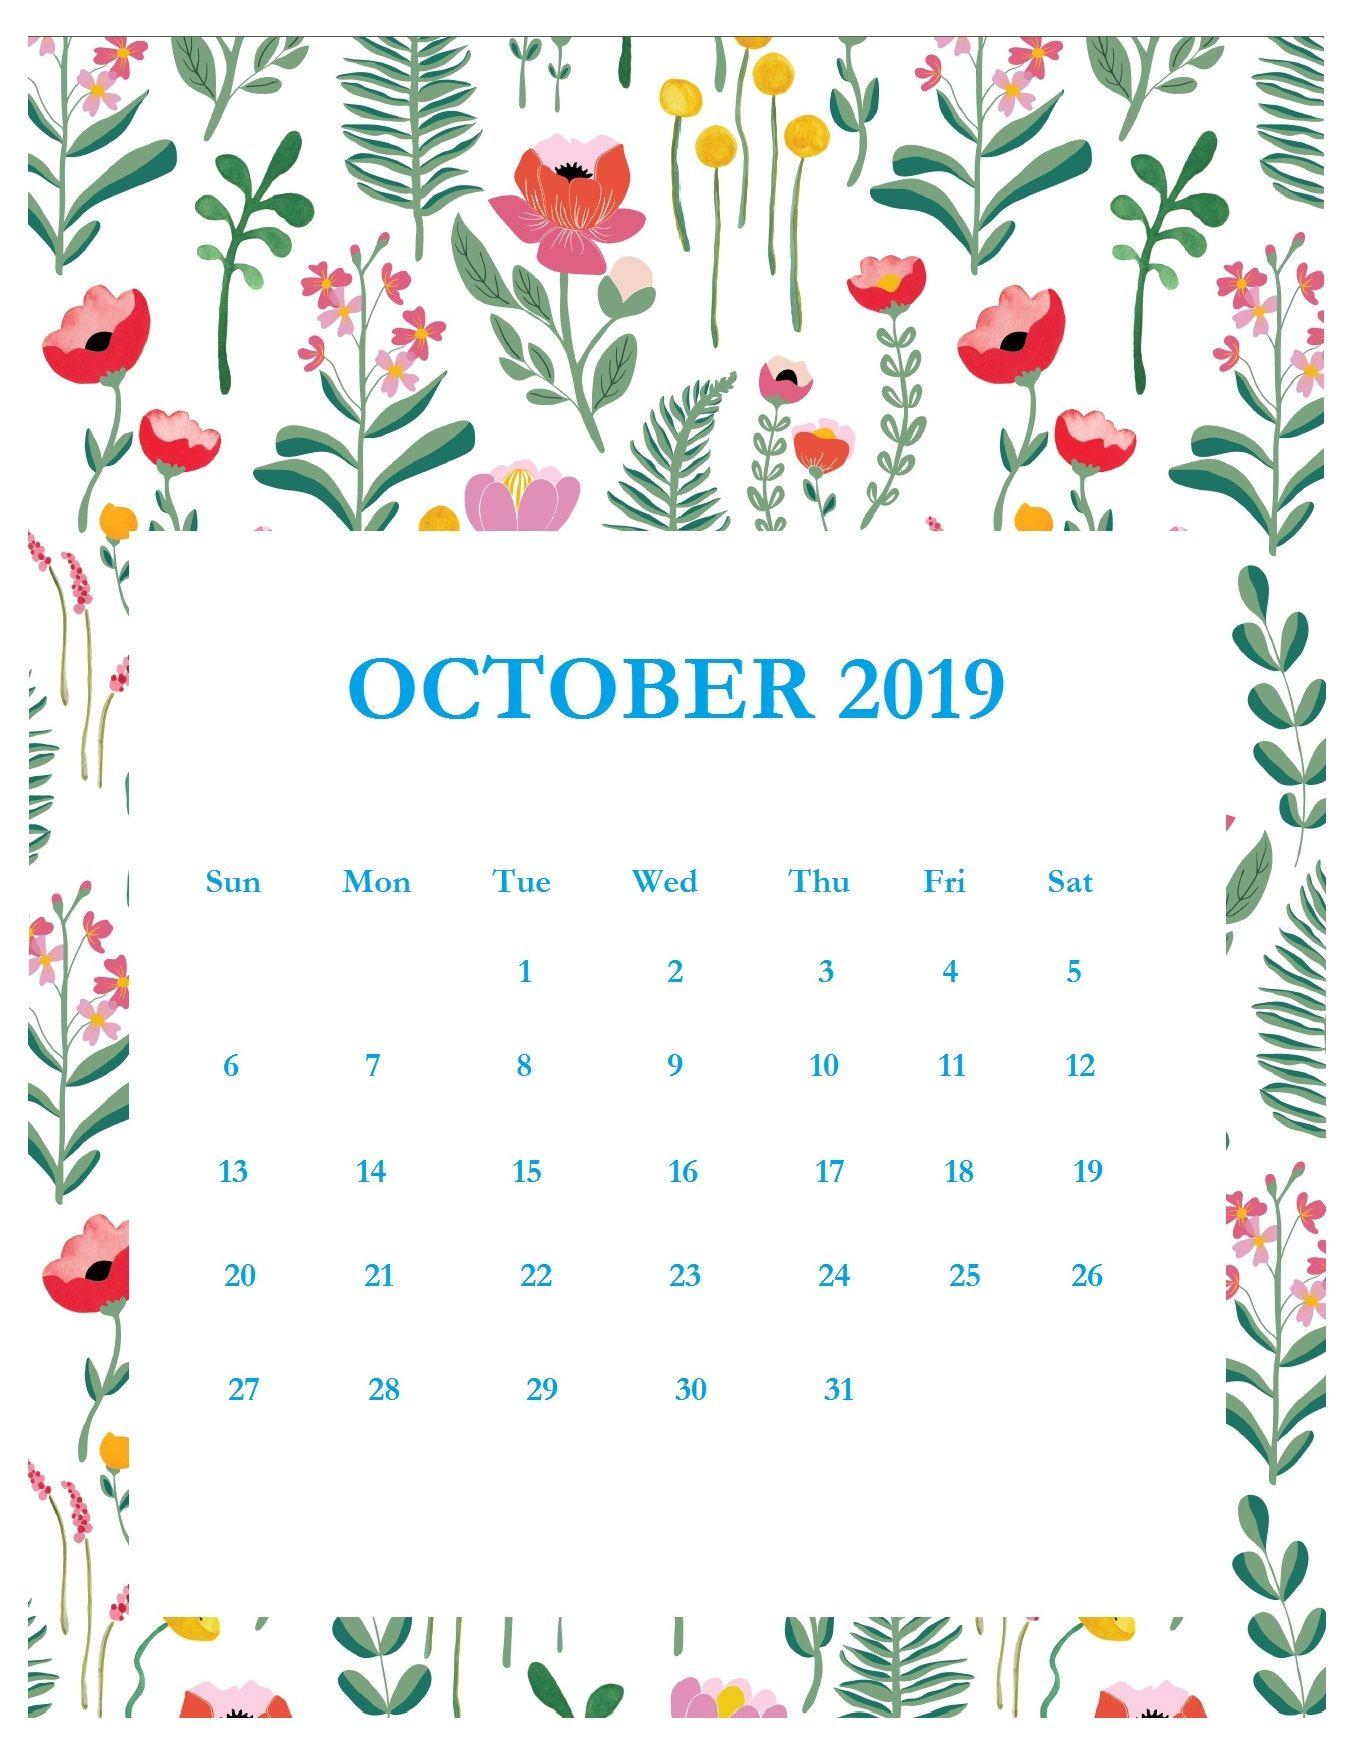 Floral Calendar October 2019 to Print